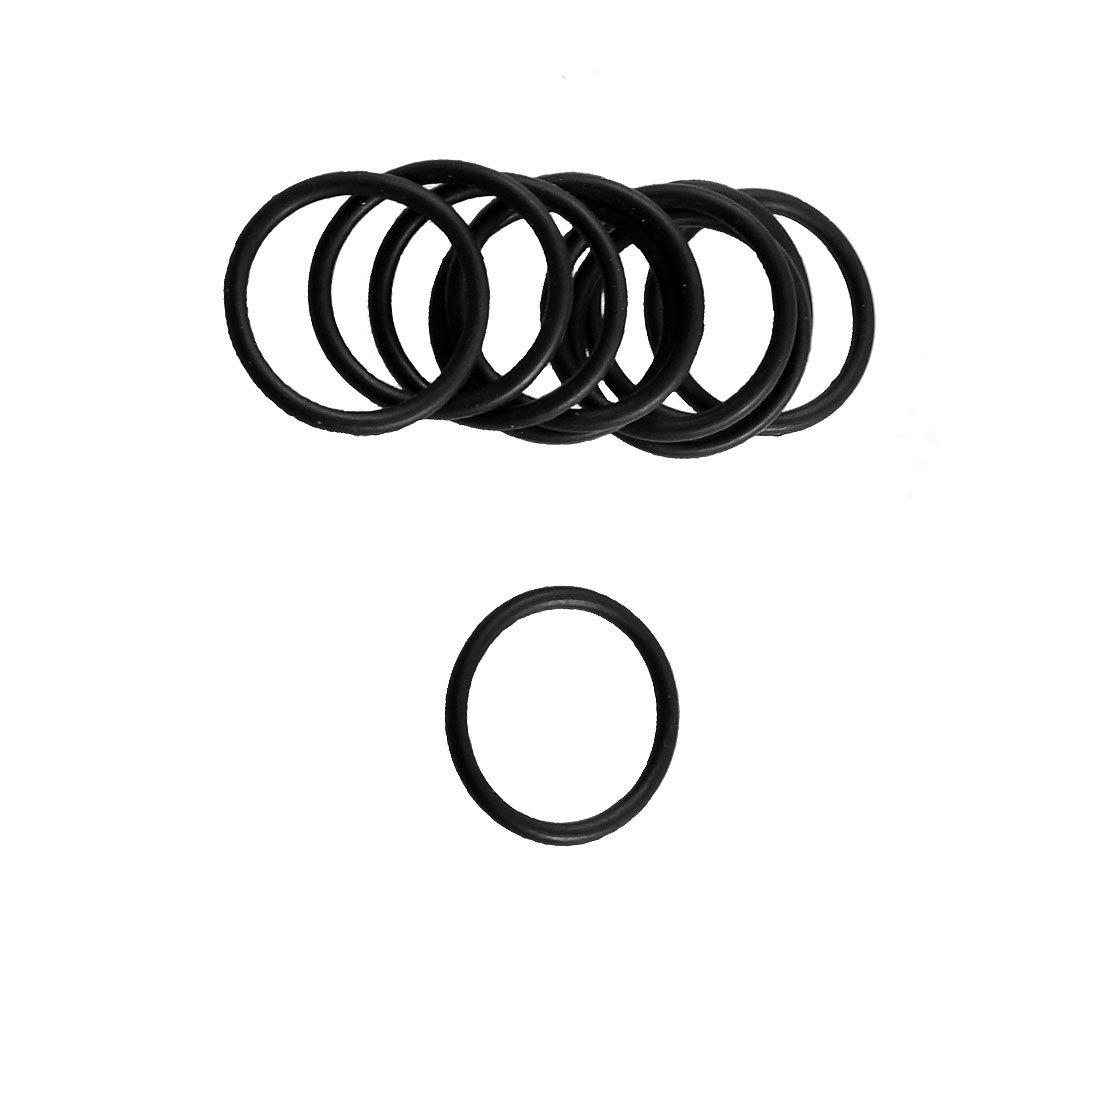 10 Pcs 19.6mm x 16mm x 1.8mm Black Rubber O Ring Oil Sealing Gasket sourcingmap a12100800ux1080